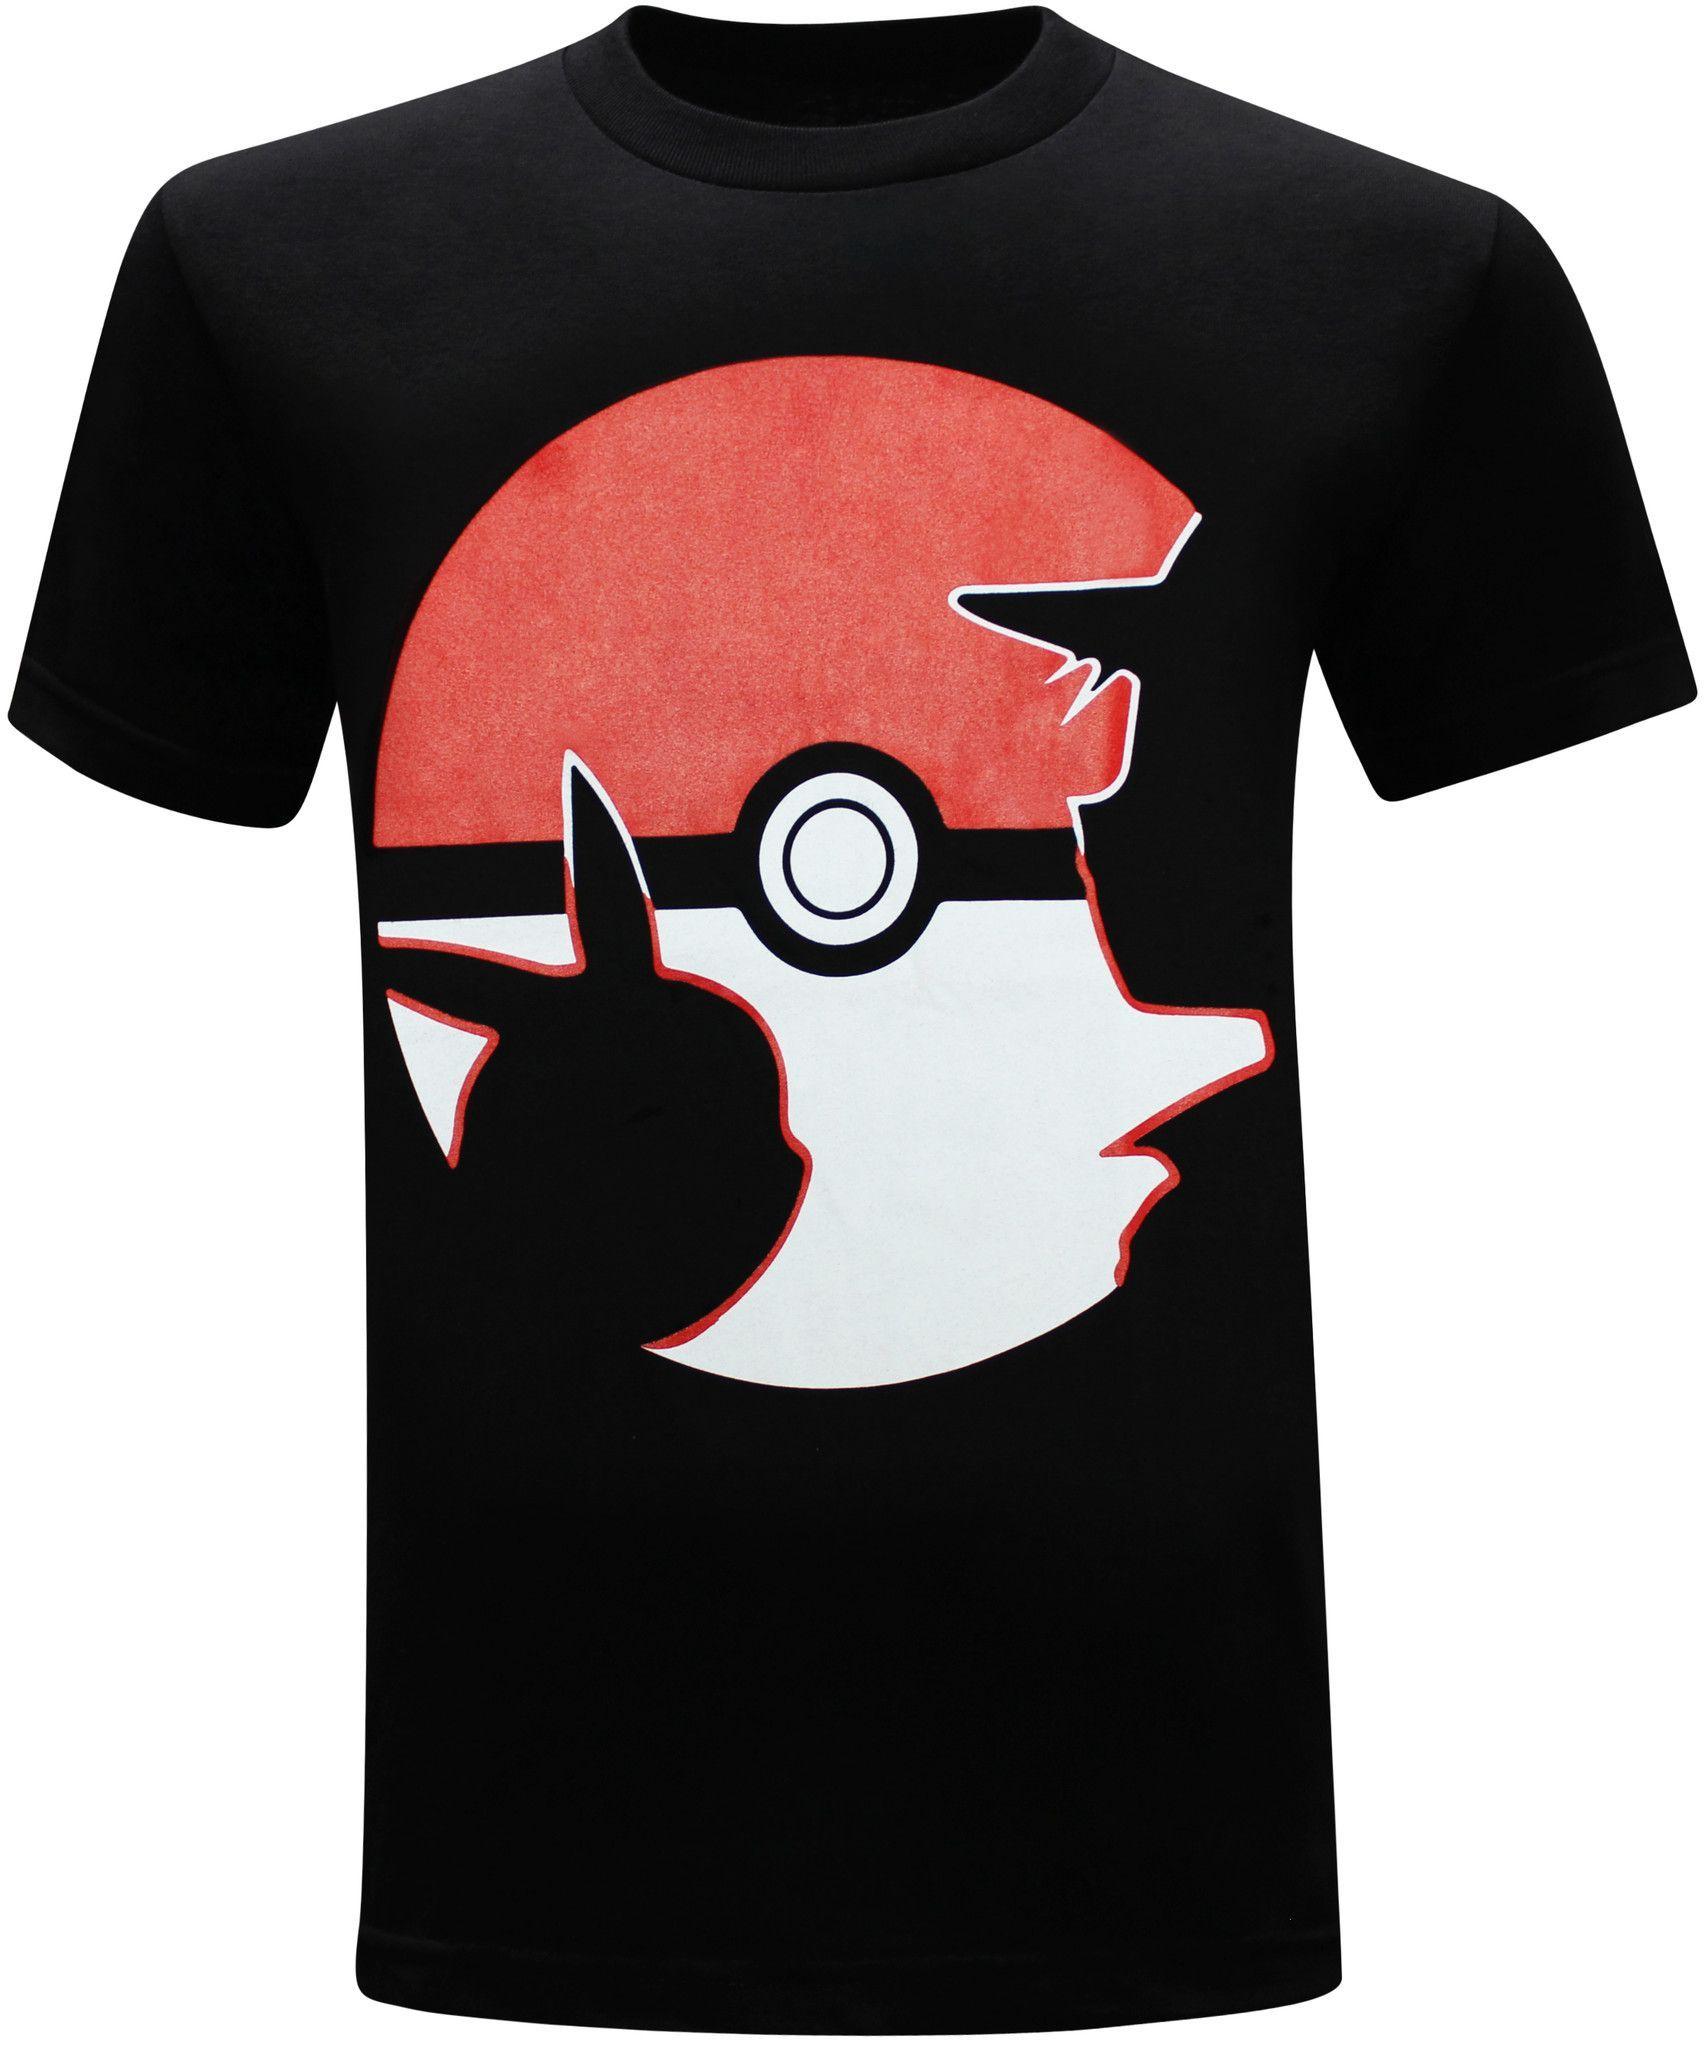 Pokemon Go Pikachu and Ash Silhouette Men's T-Shirt